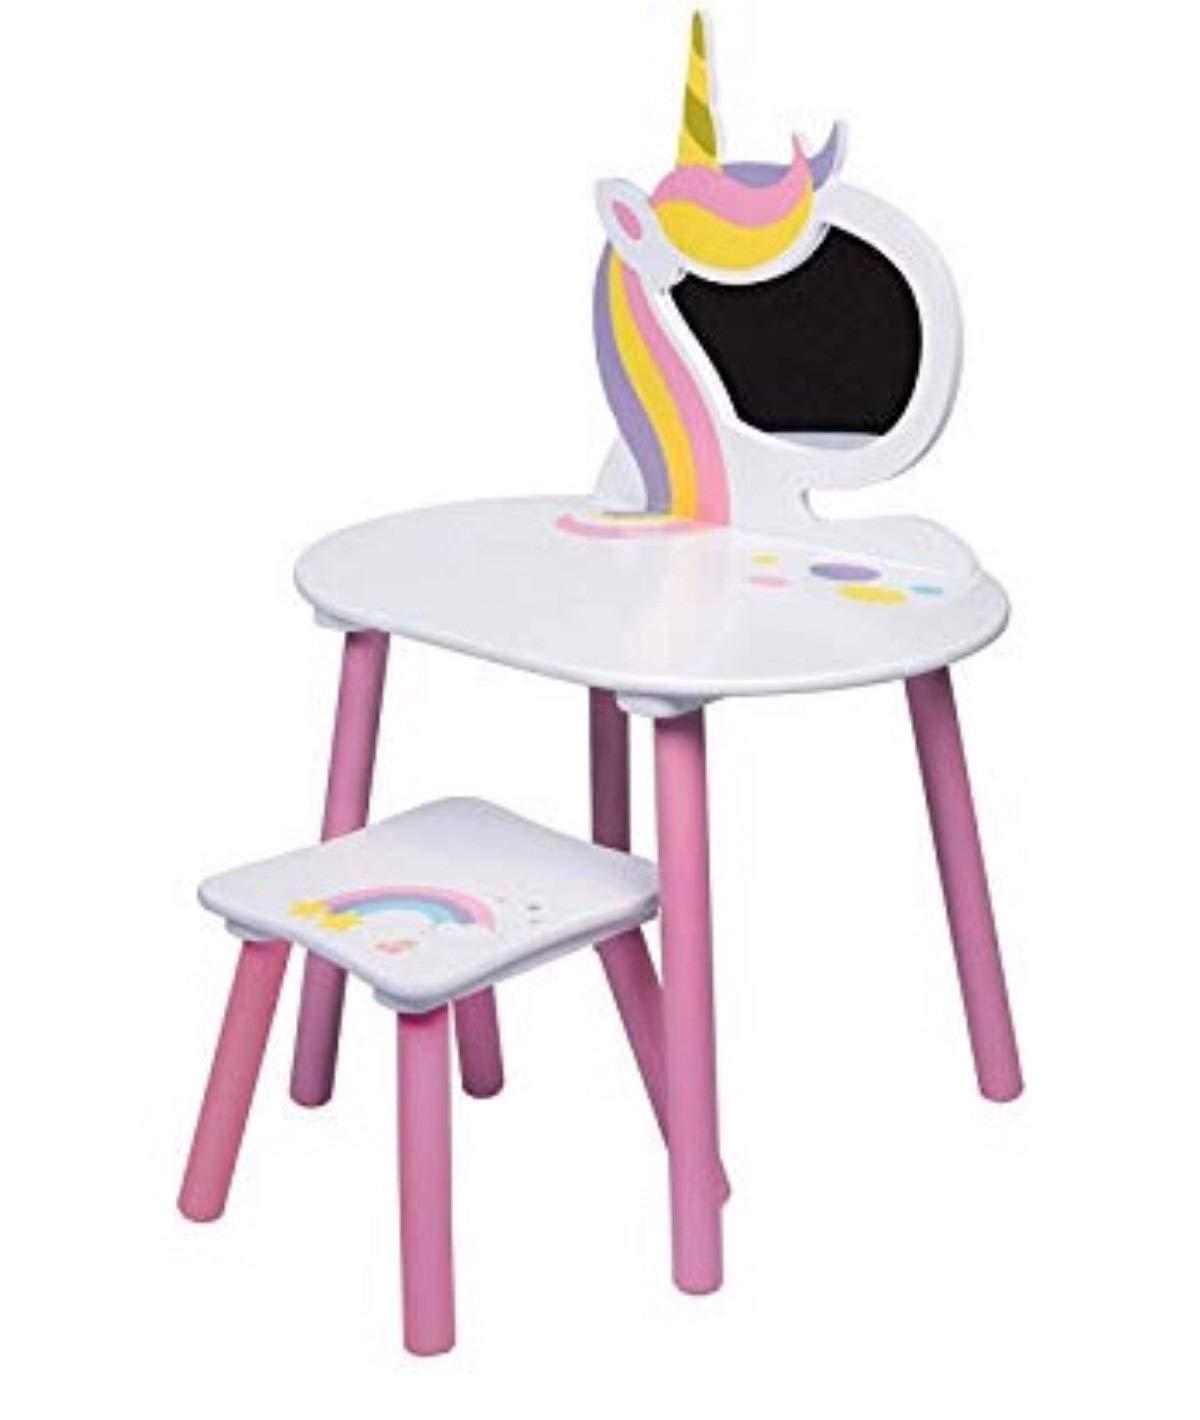 Unicorn Childrens Bedroom Vanity Set with Stool & Mirror Wooden Furniture